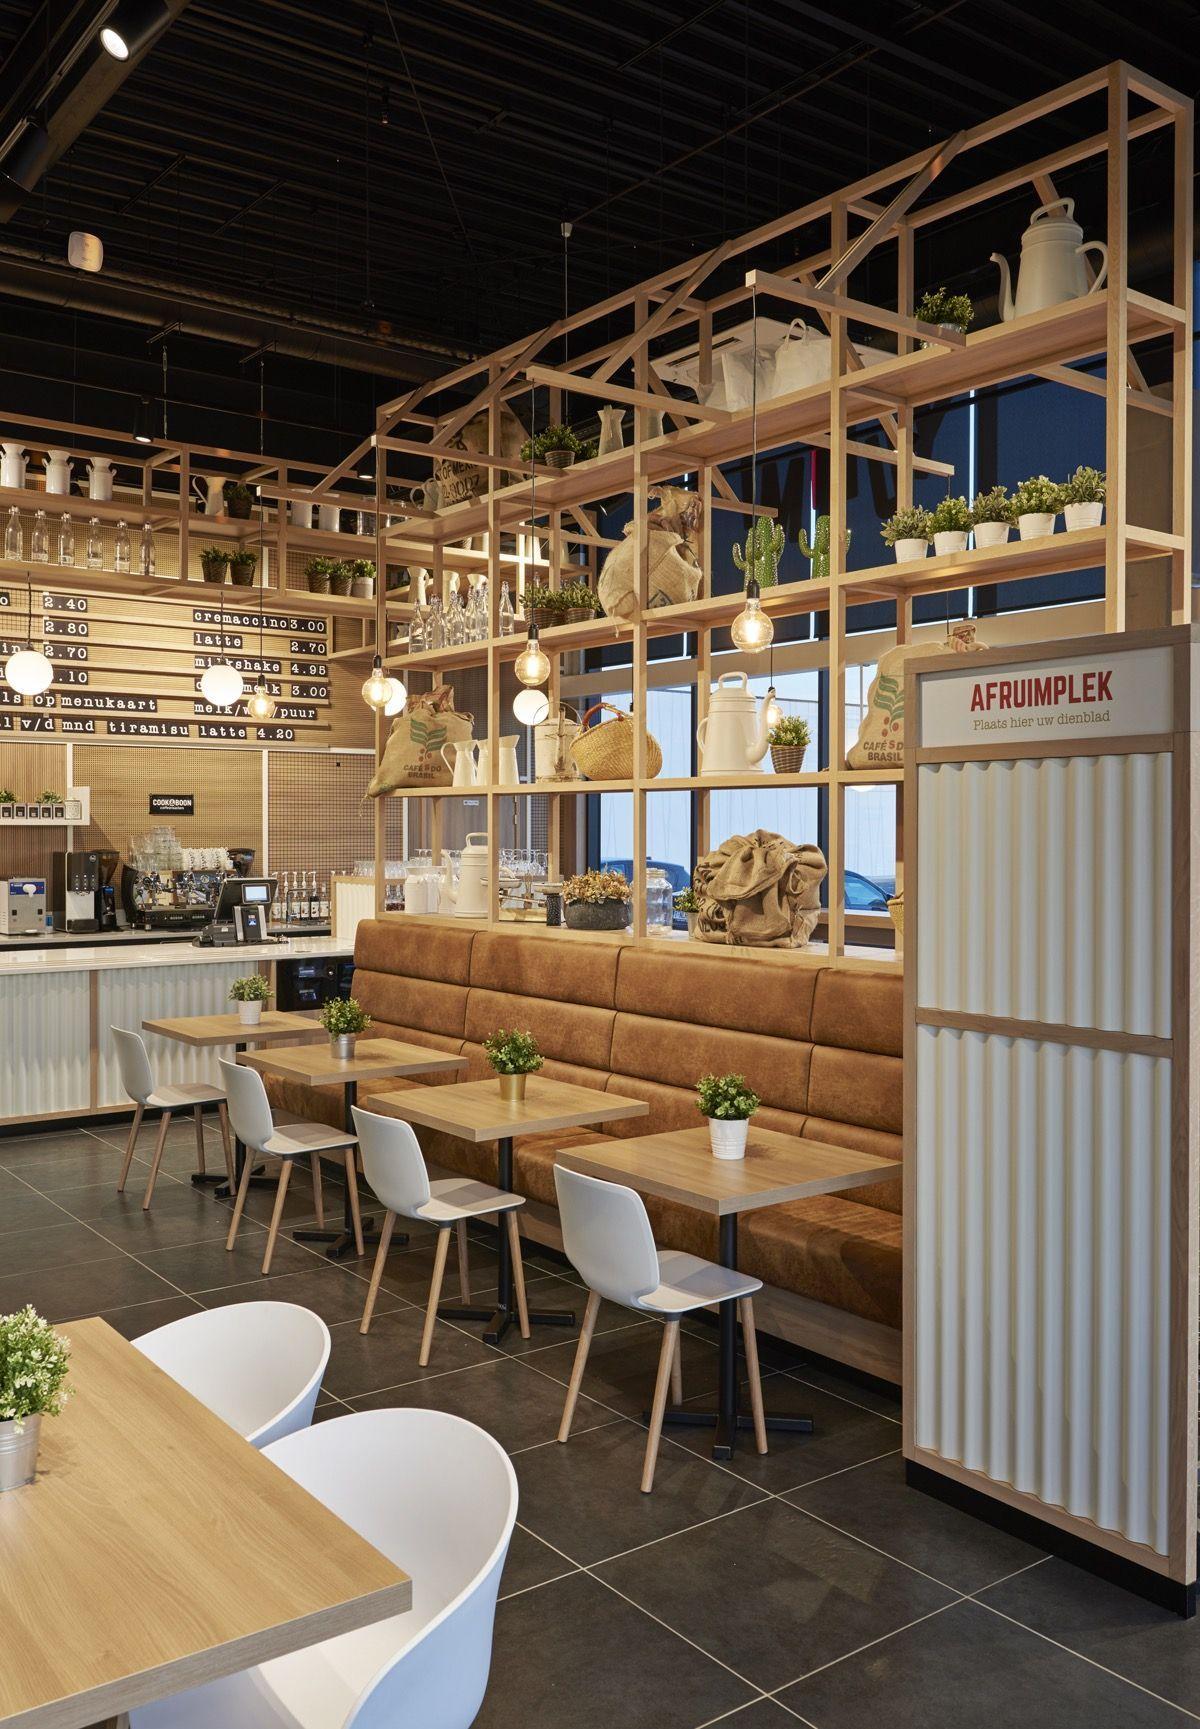 27 Creative Diy Coffee Bar Ideas For Your Cozy Home Coffee Shop Interior Design Coffee Bar Design Coffee Shop Bar